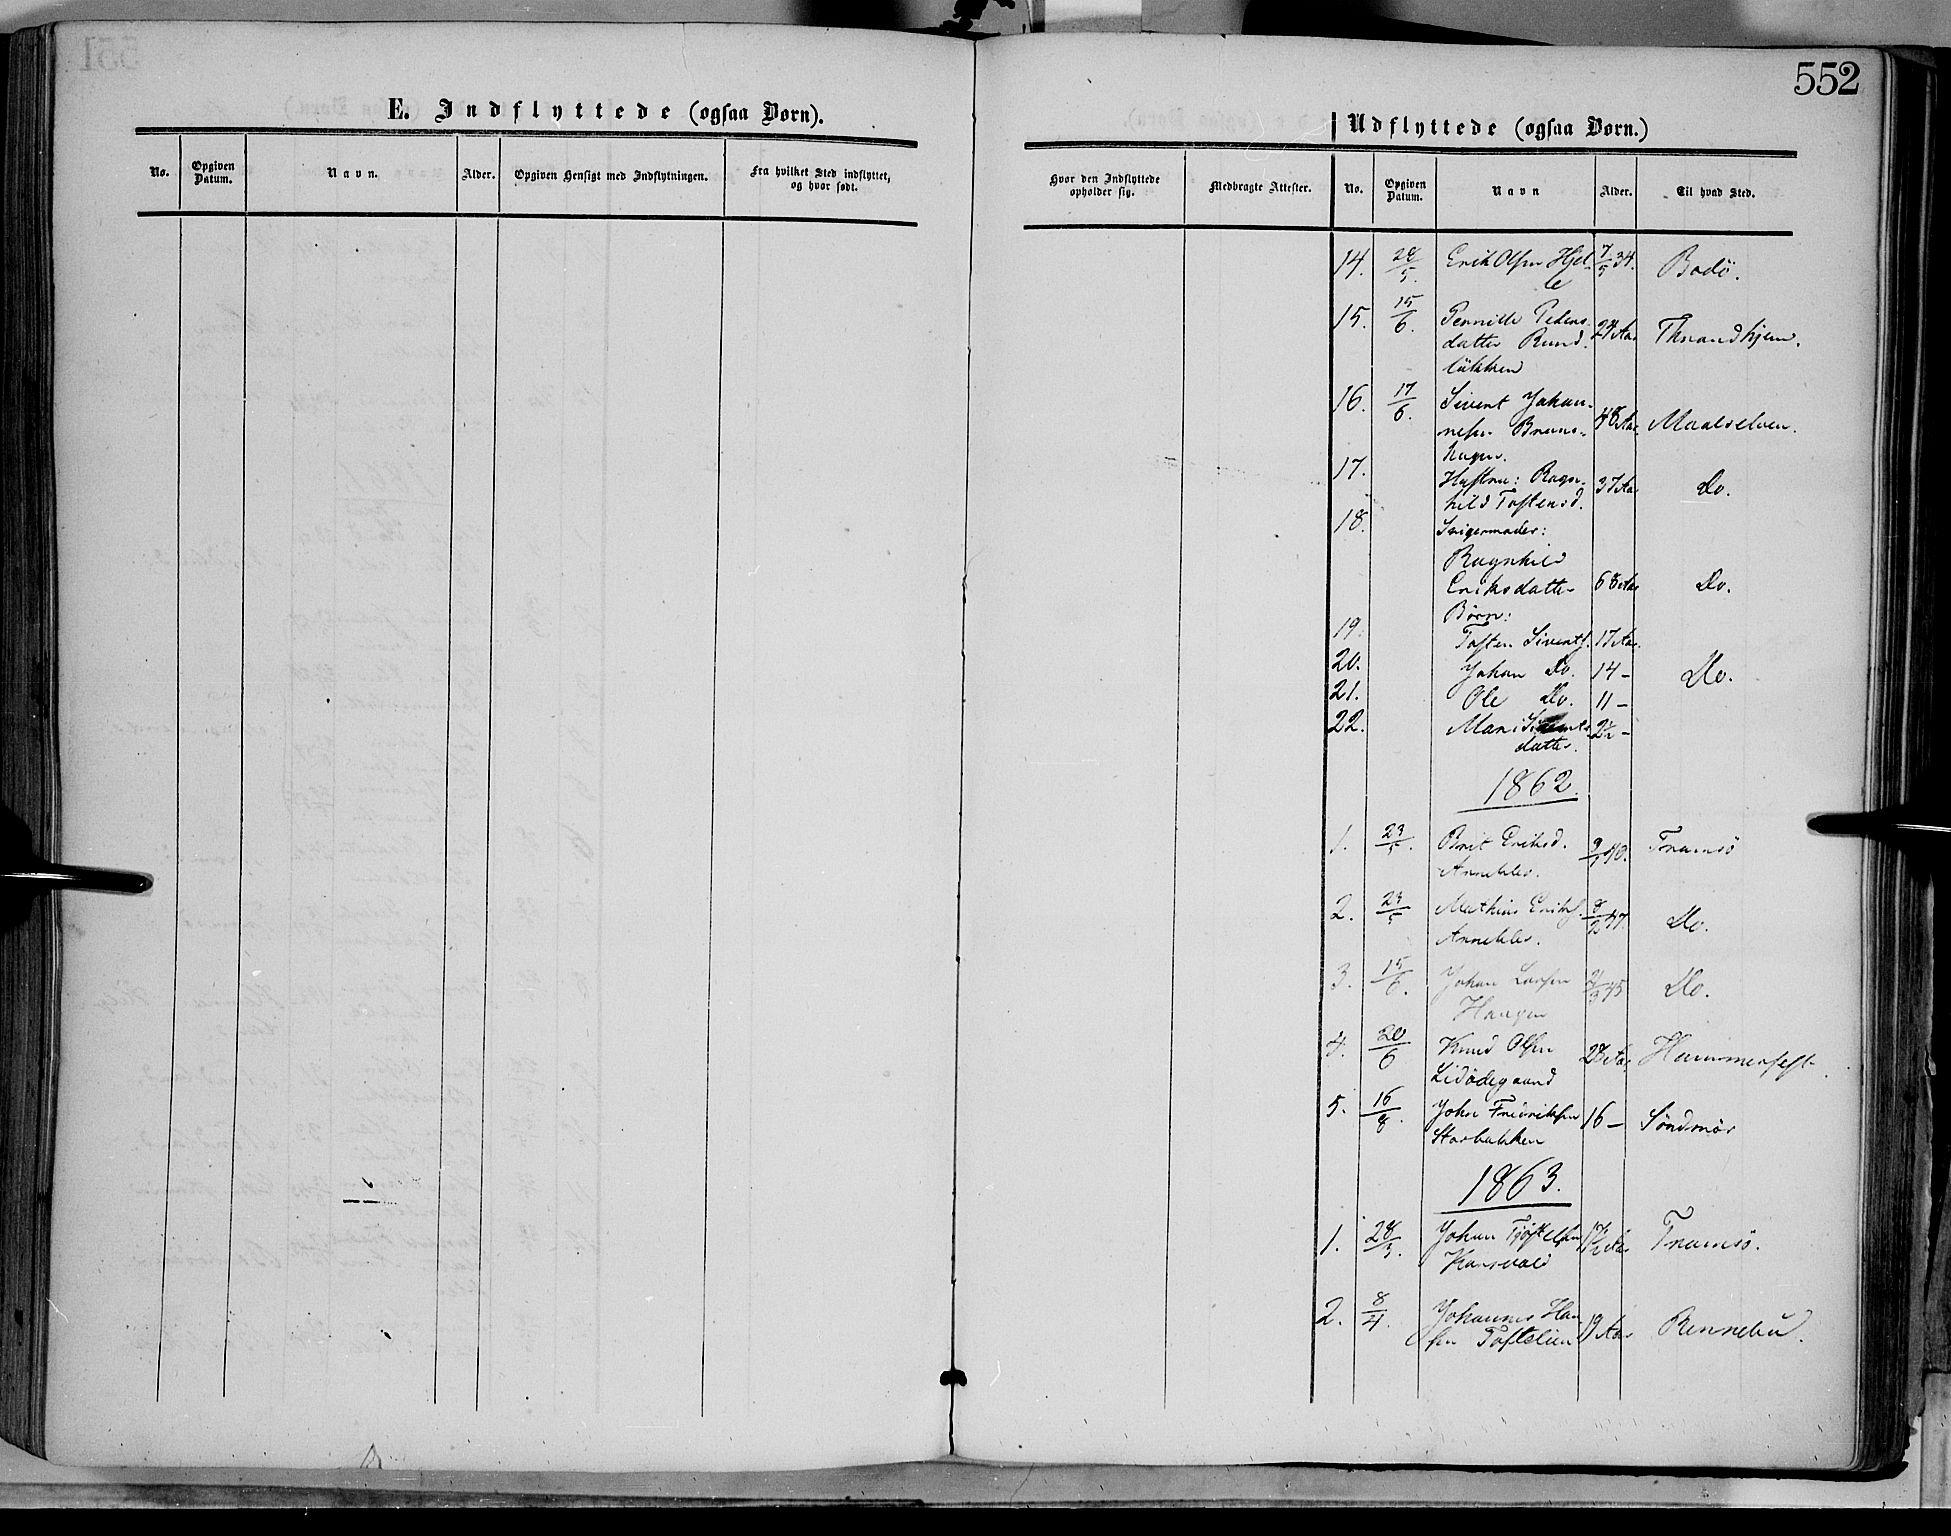 SAH, Dovre prestekontor, Ministerialbok nr. 1, 1854-1878, s. 552